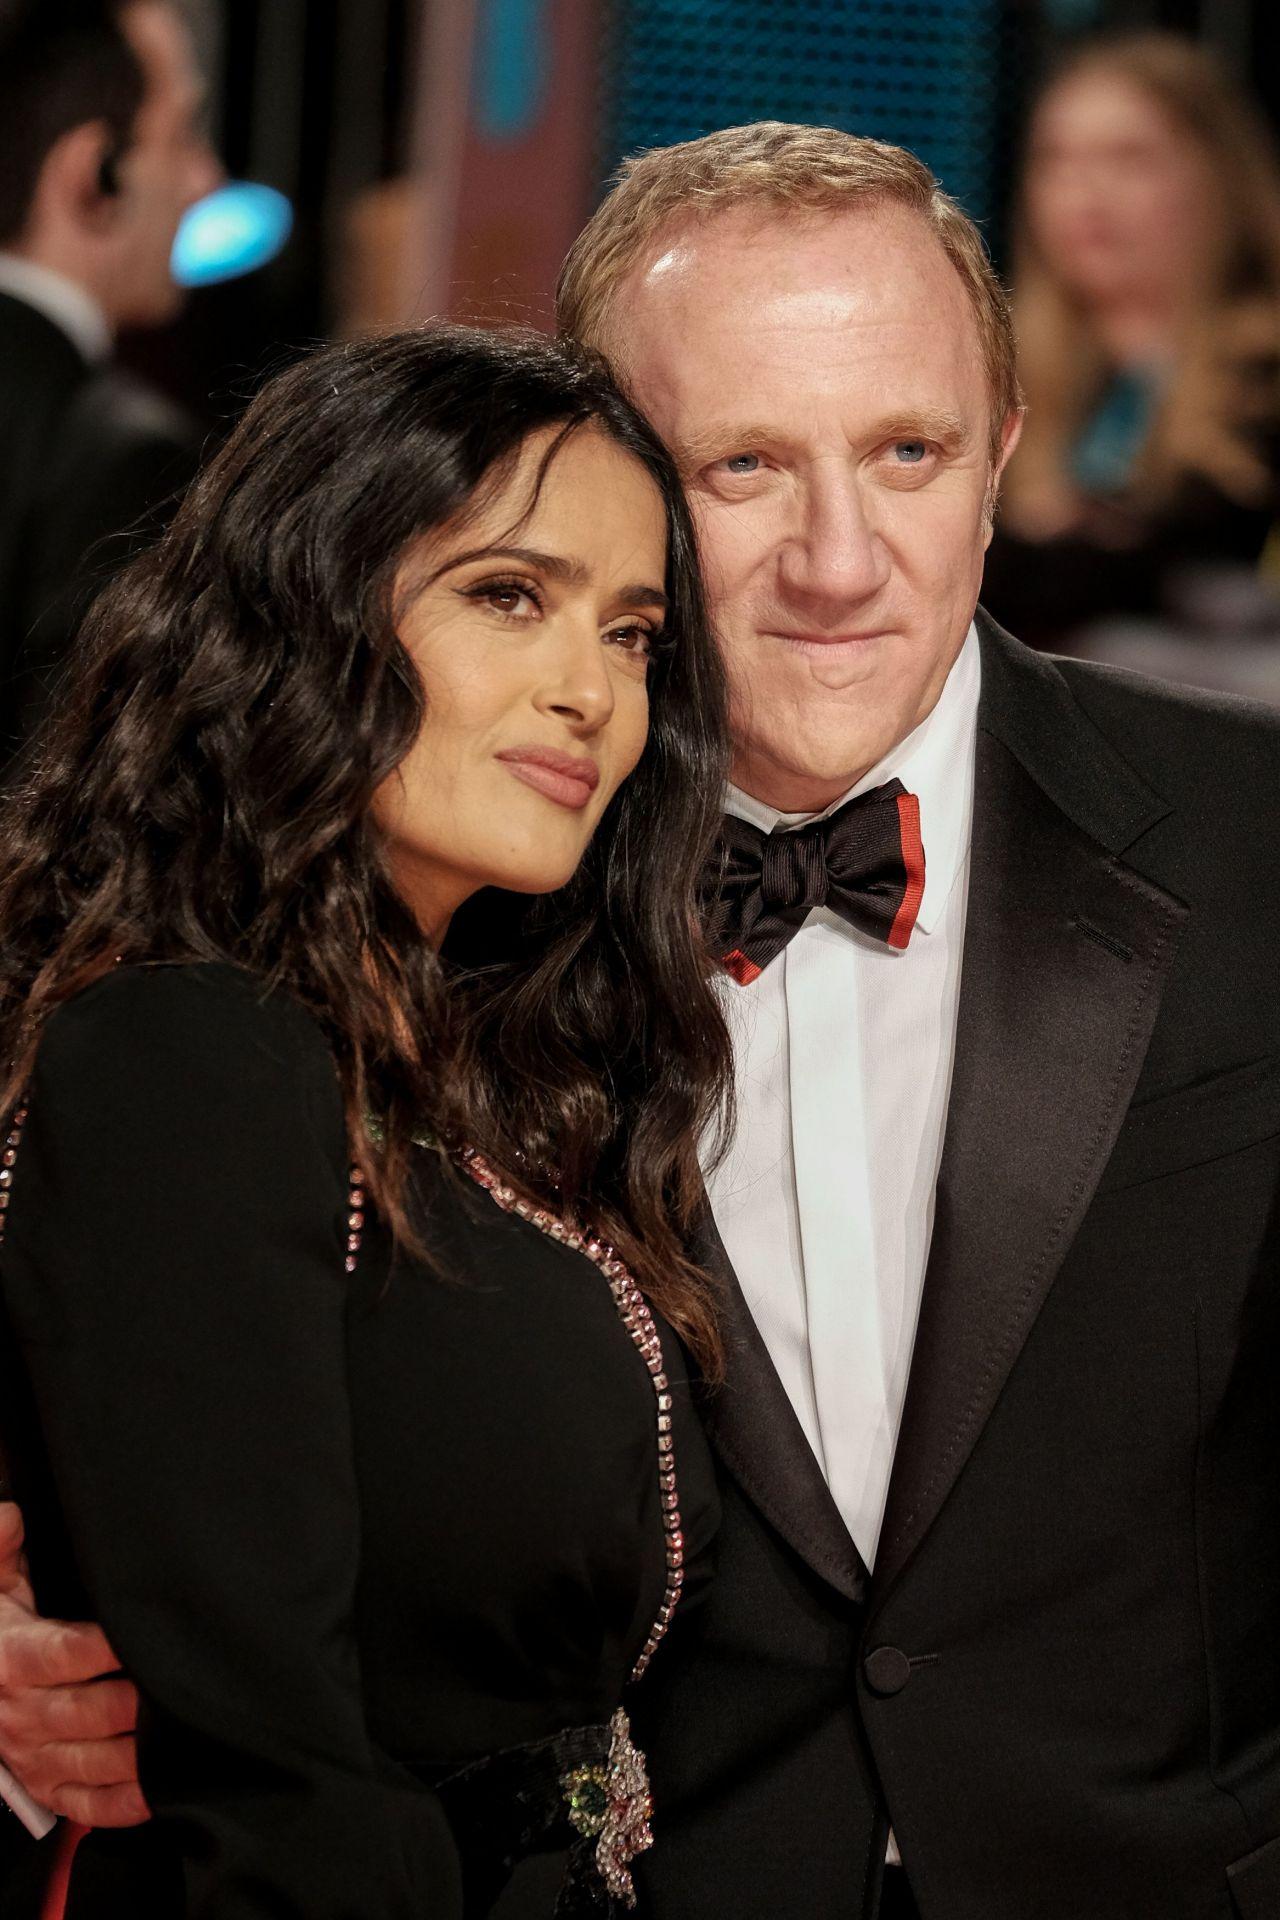 http://celebmafia.com/wp-content/uploads/2018/02/salma-hayek-2018-british-academy-film-awards-3.jpg